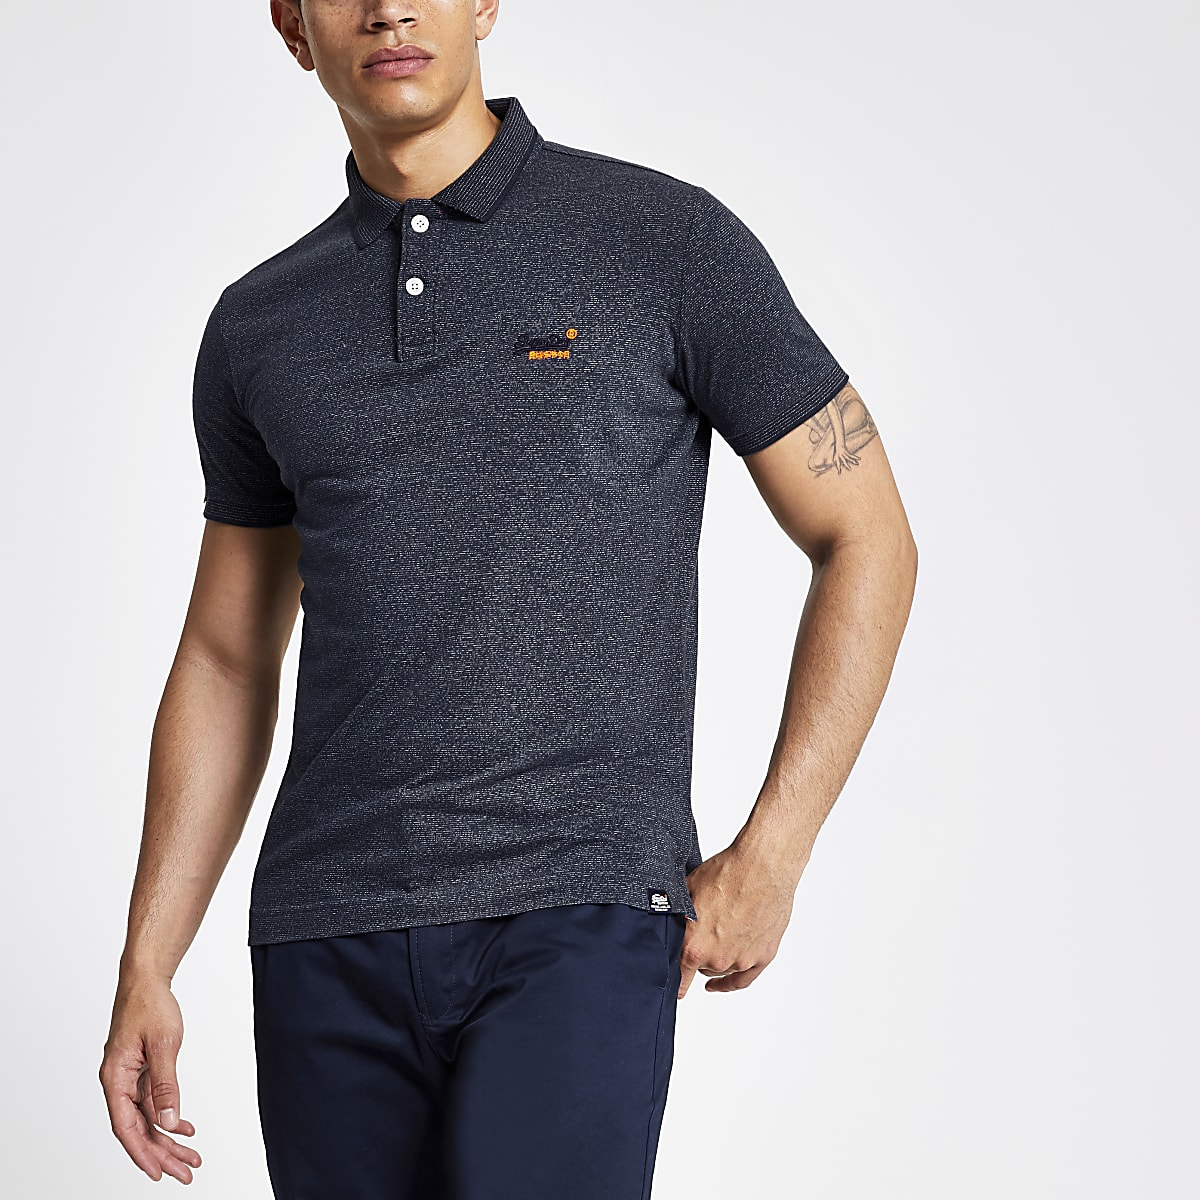 Superdry navy orange logo polo shirt